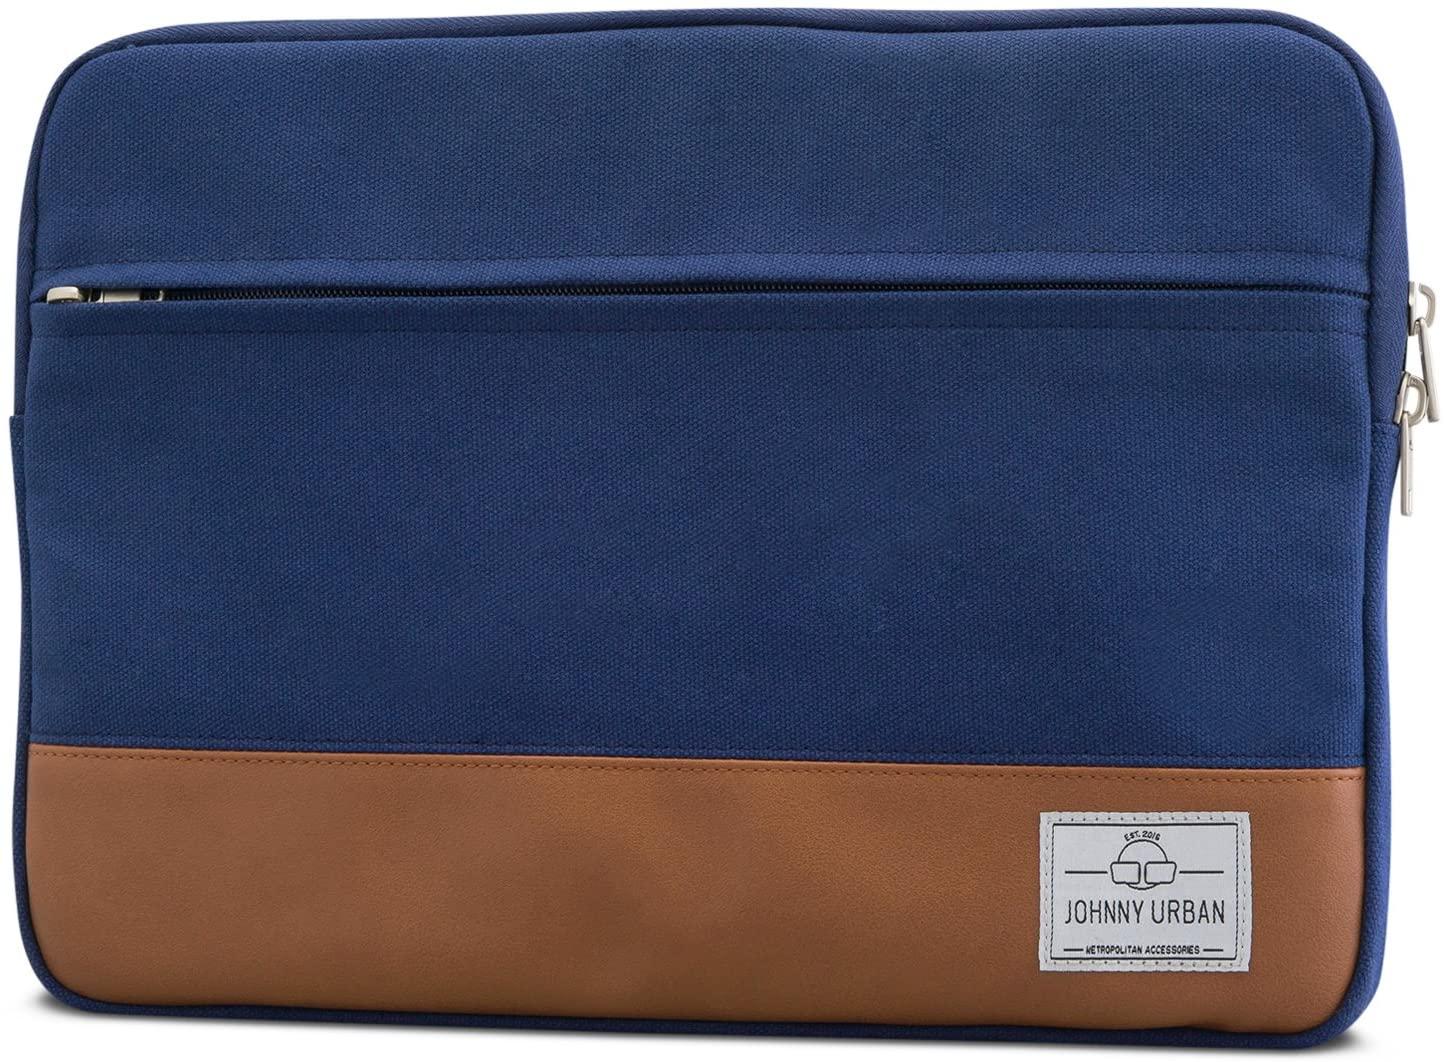 Laptop Sleeve 14 Inch Blue - Johnny Urban Canvas Notebook Case MacBook Bag